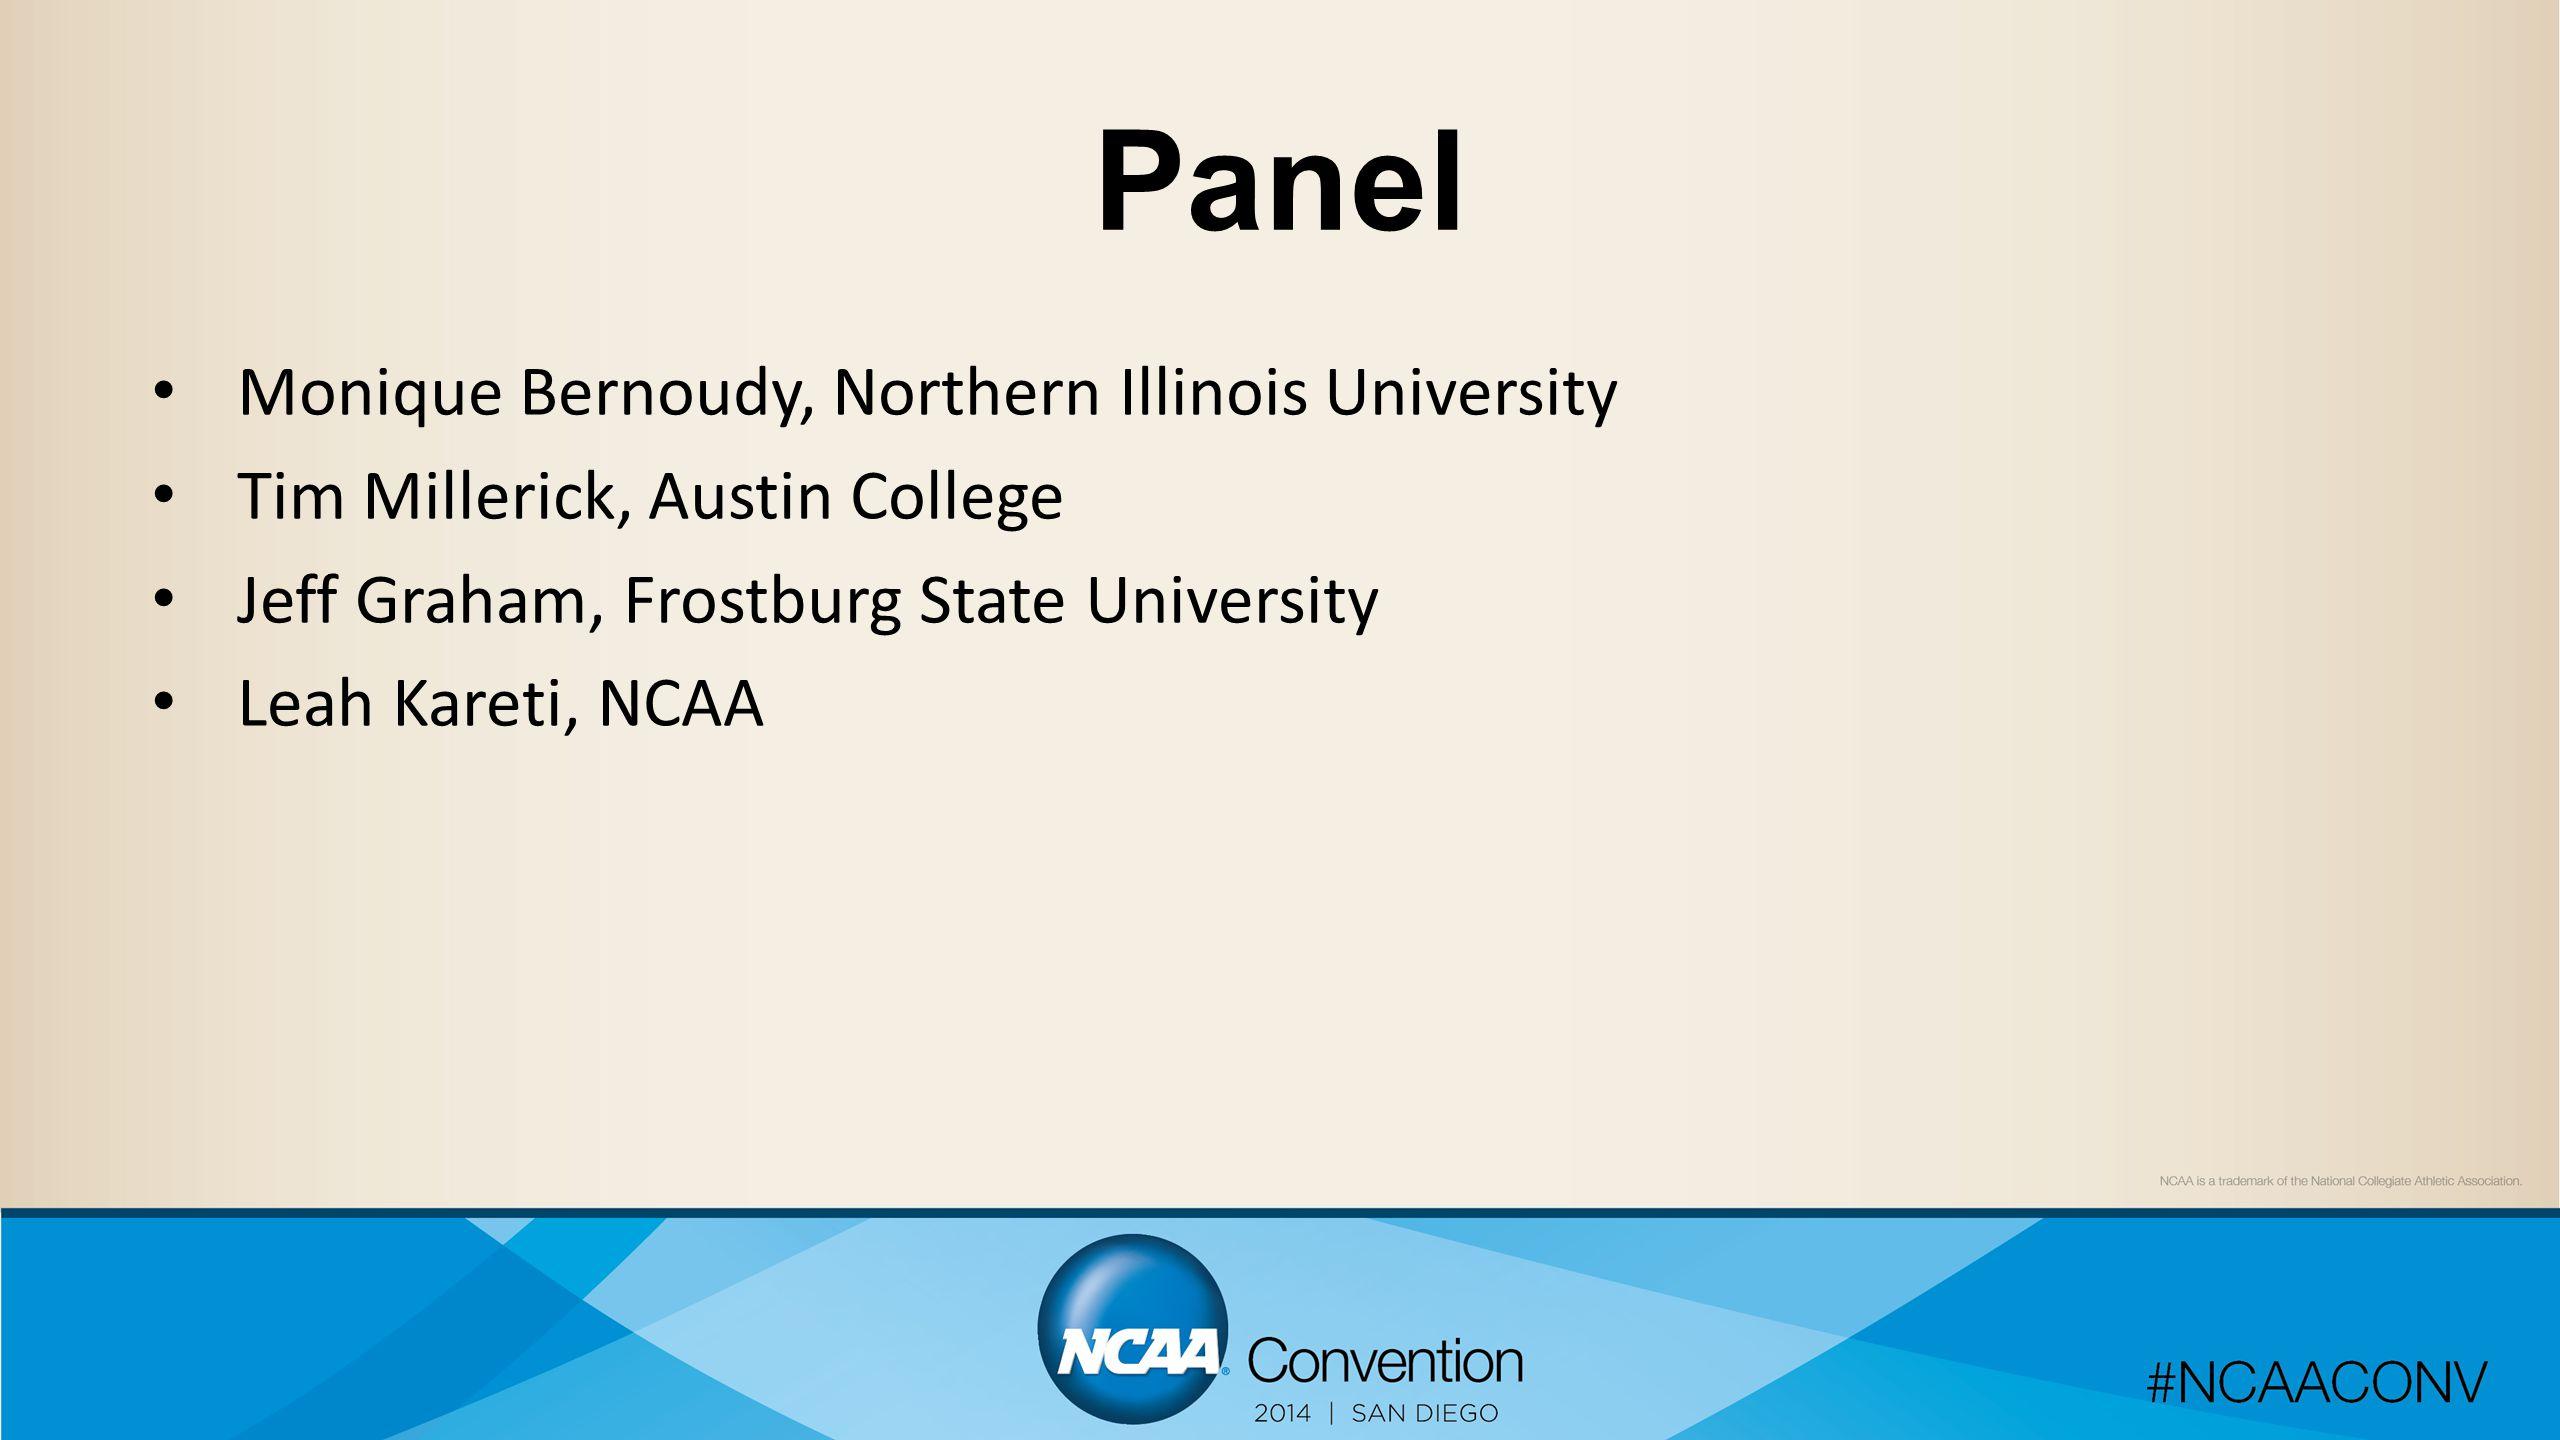 Panel Monique Bernoudy, Northern Illinois University Tim Millerick, Austin College Jeff Graham, Frostburg State University Leah Kareti, NCAA